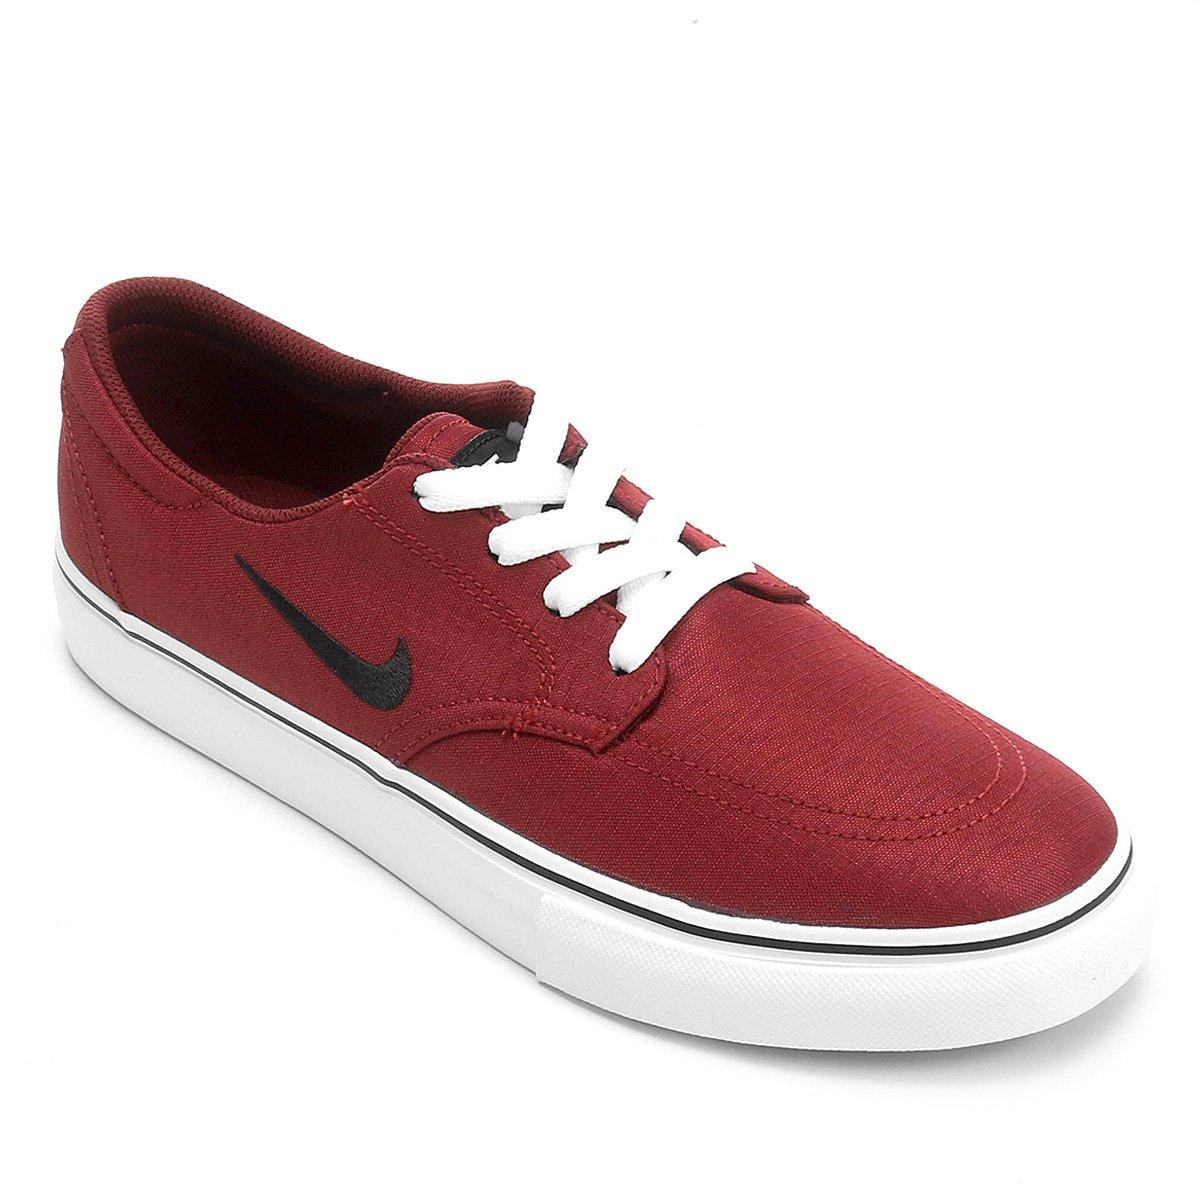 02218abb183 Tênis Nike SB Clutch Masculino - Compre Agora